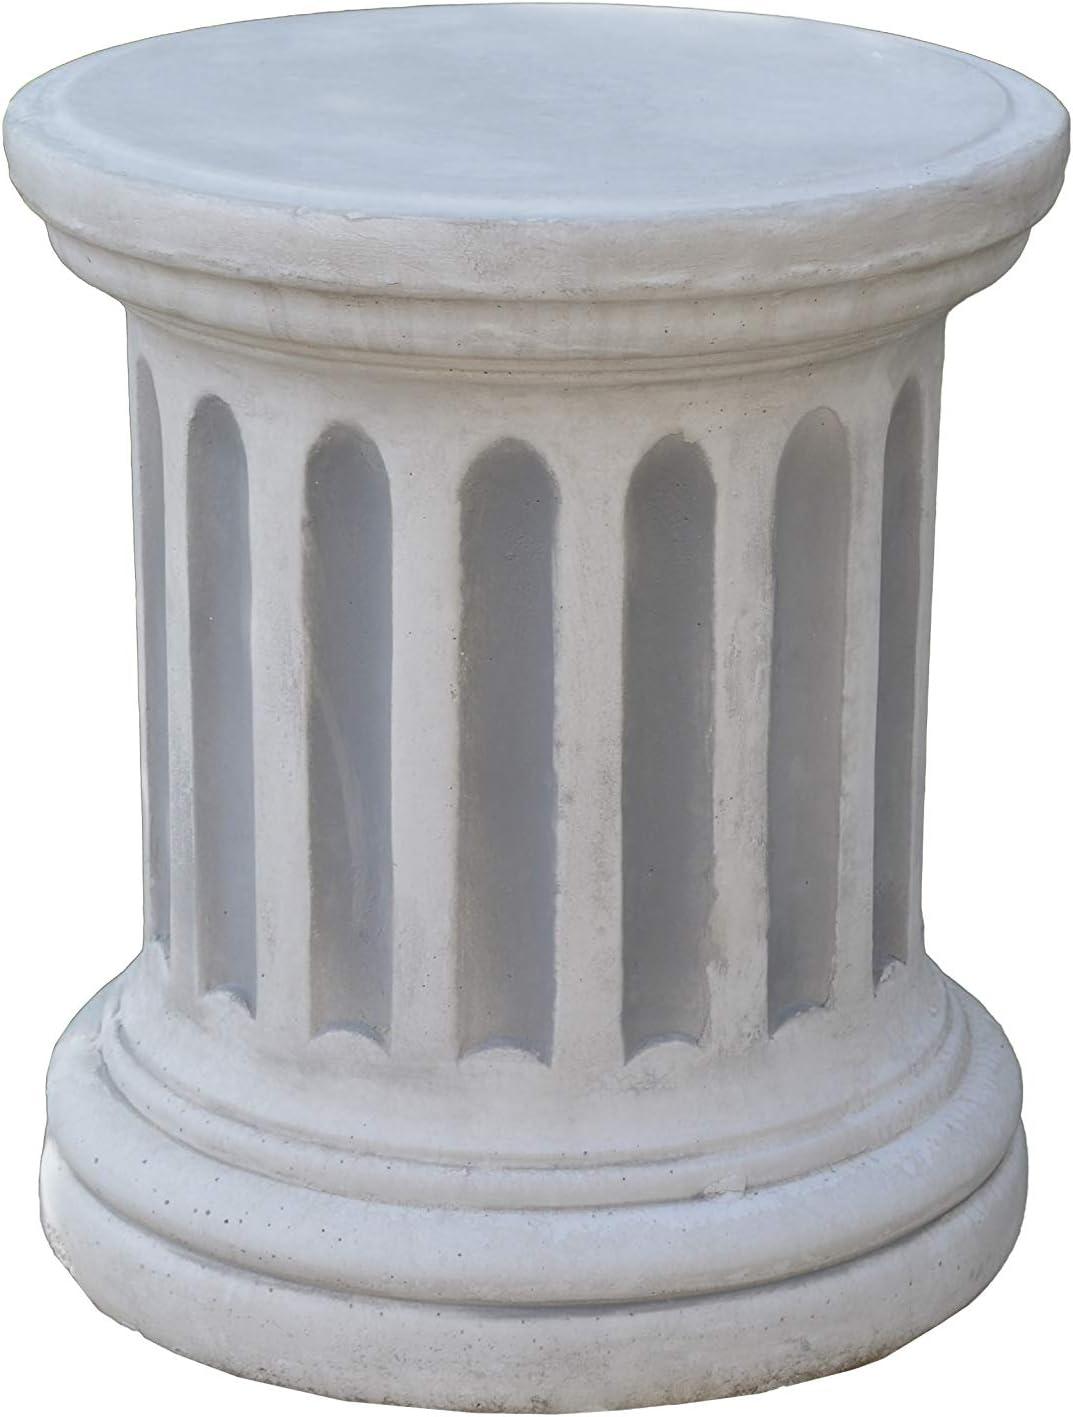 Gartendekoparadies.de Jolie colonne ronde en pierre r/ésistante au gel